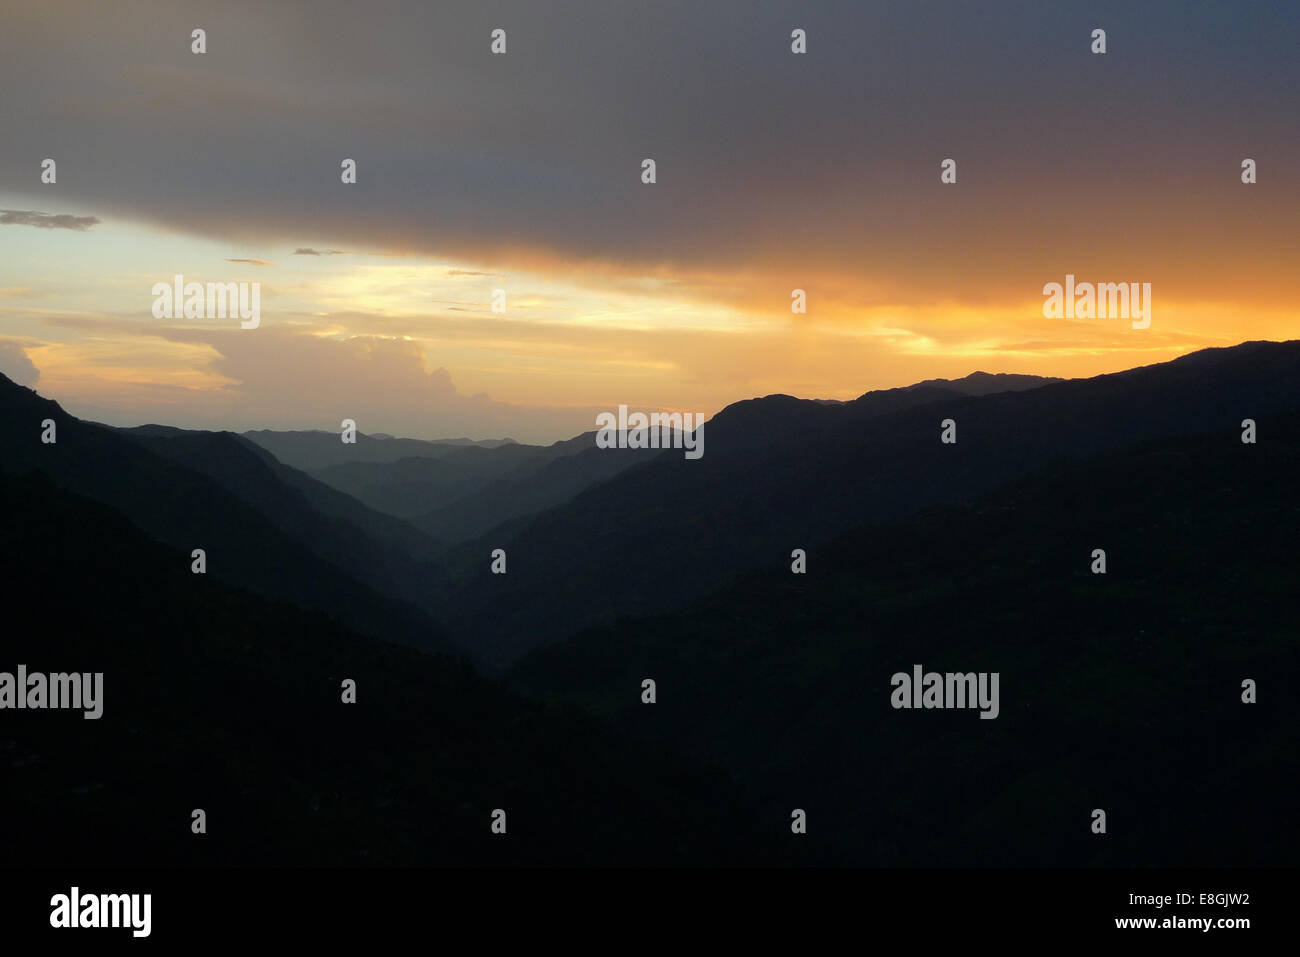 Sunset behind hills - Stock Image